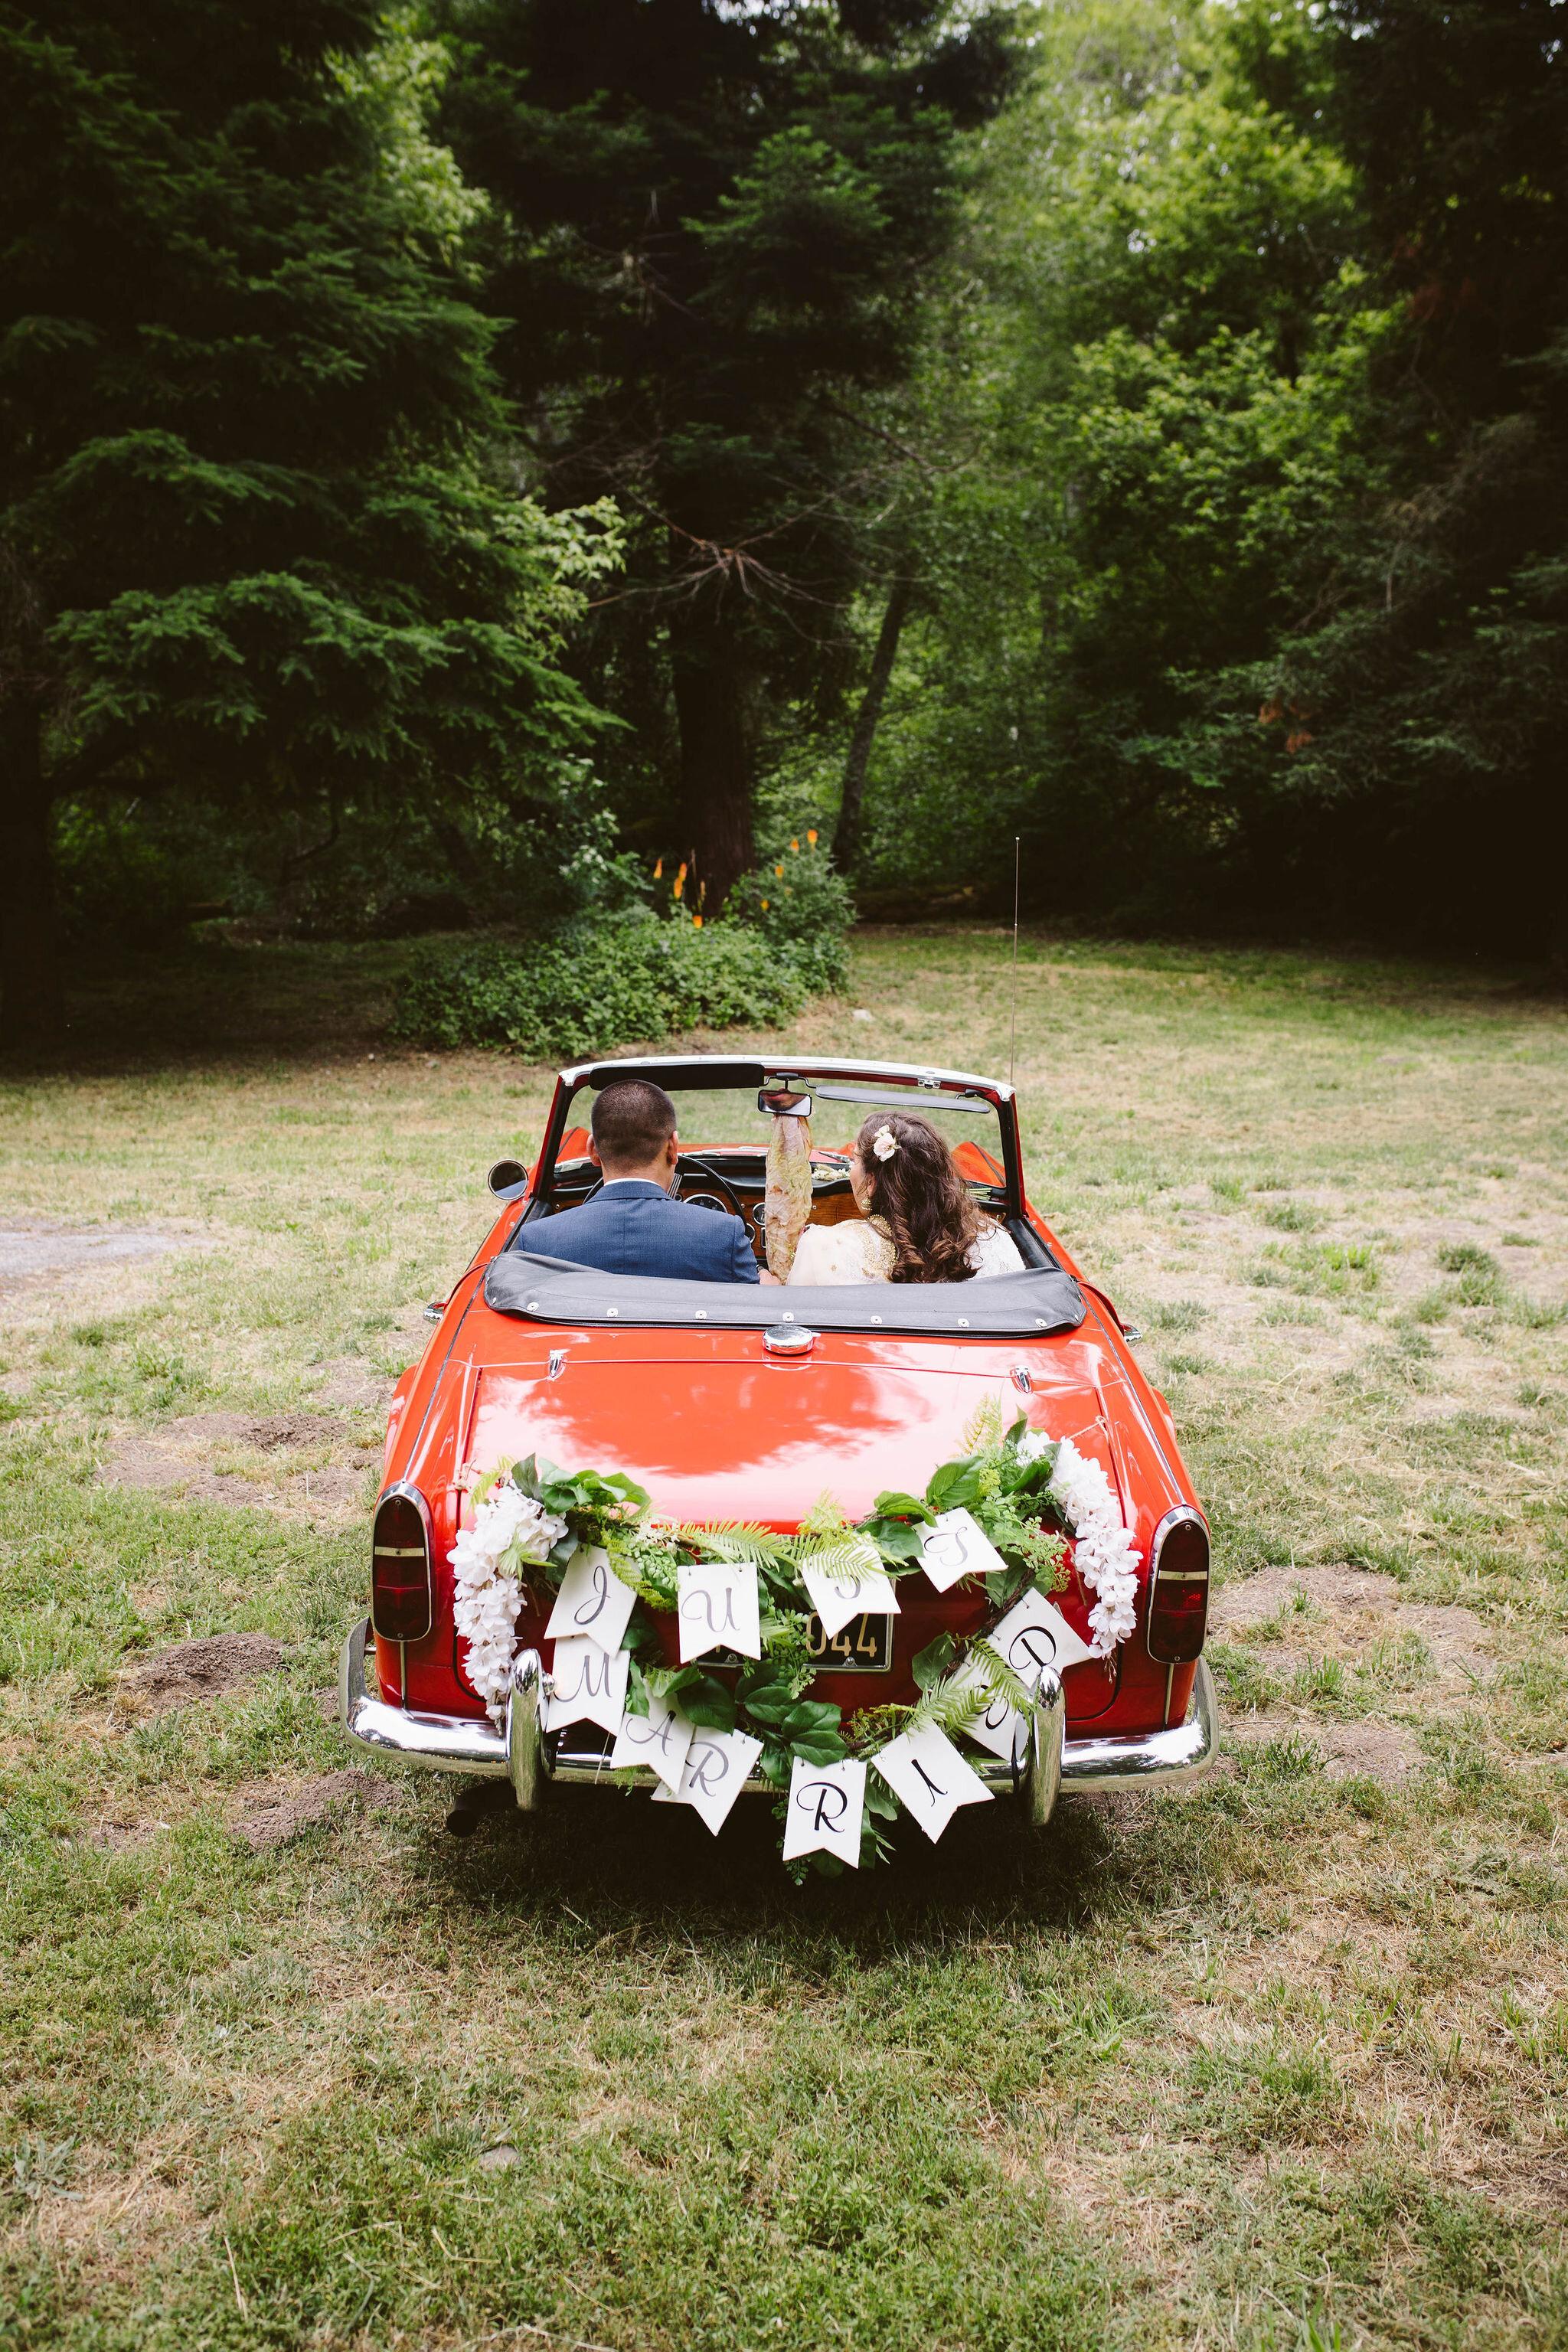 Venture-Retreat-Center-Wedding-Pescadero-Sat-Aaron-Pritam-The-Shalom-Imaginative-554.jpg